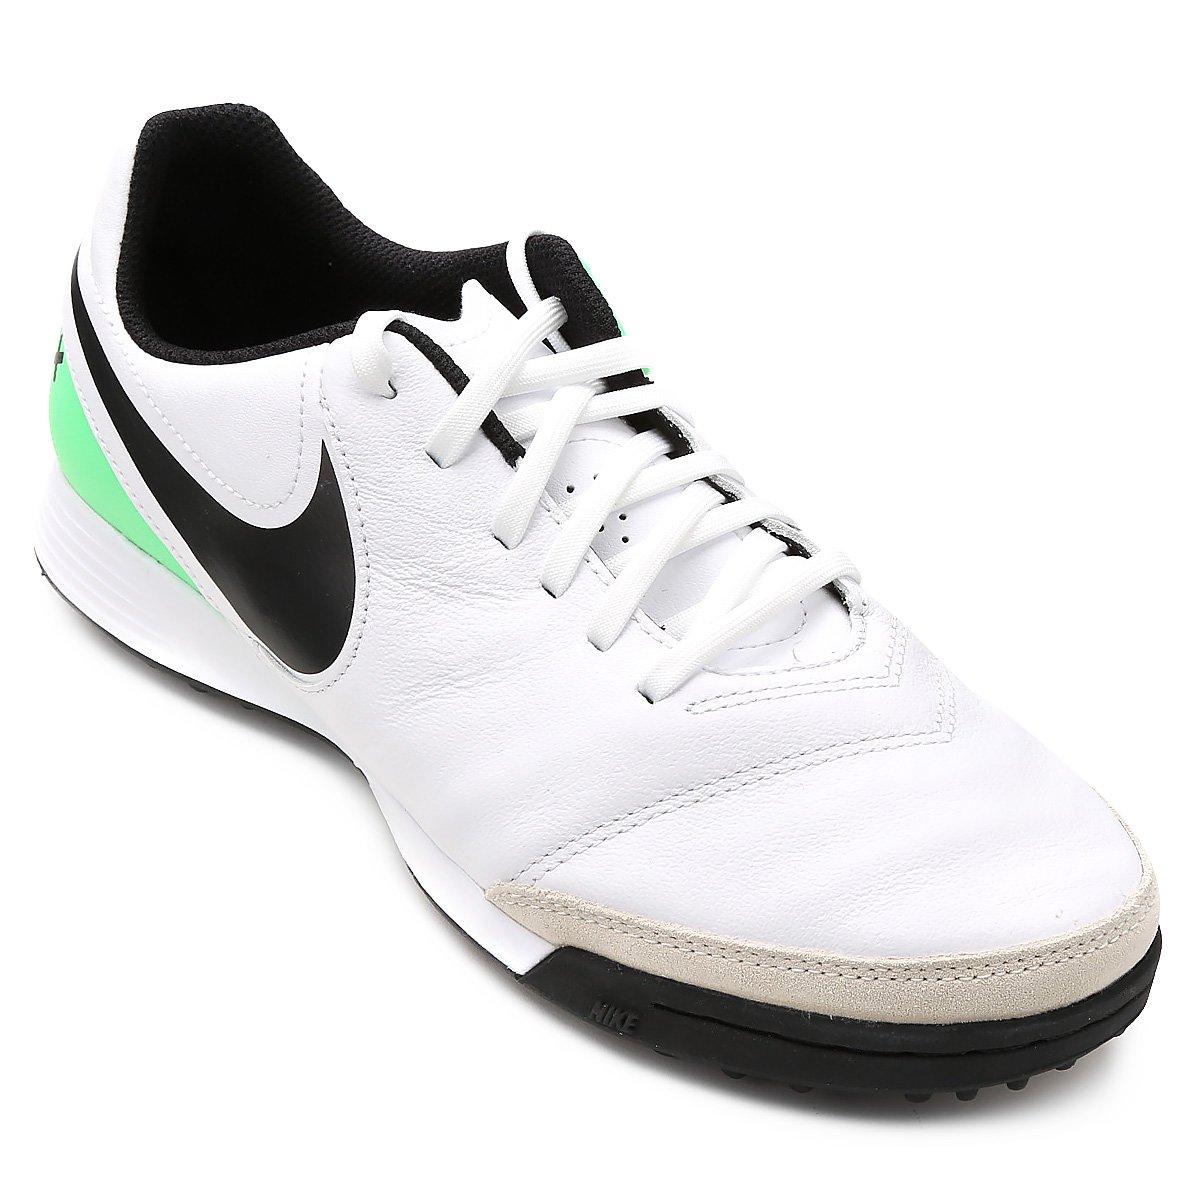 c5aaa7bdc7 Chuteira Society Nike Tiempo Genio 2 Leather TF - Branco e Verde ...